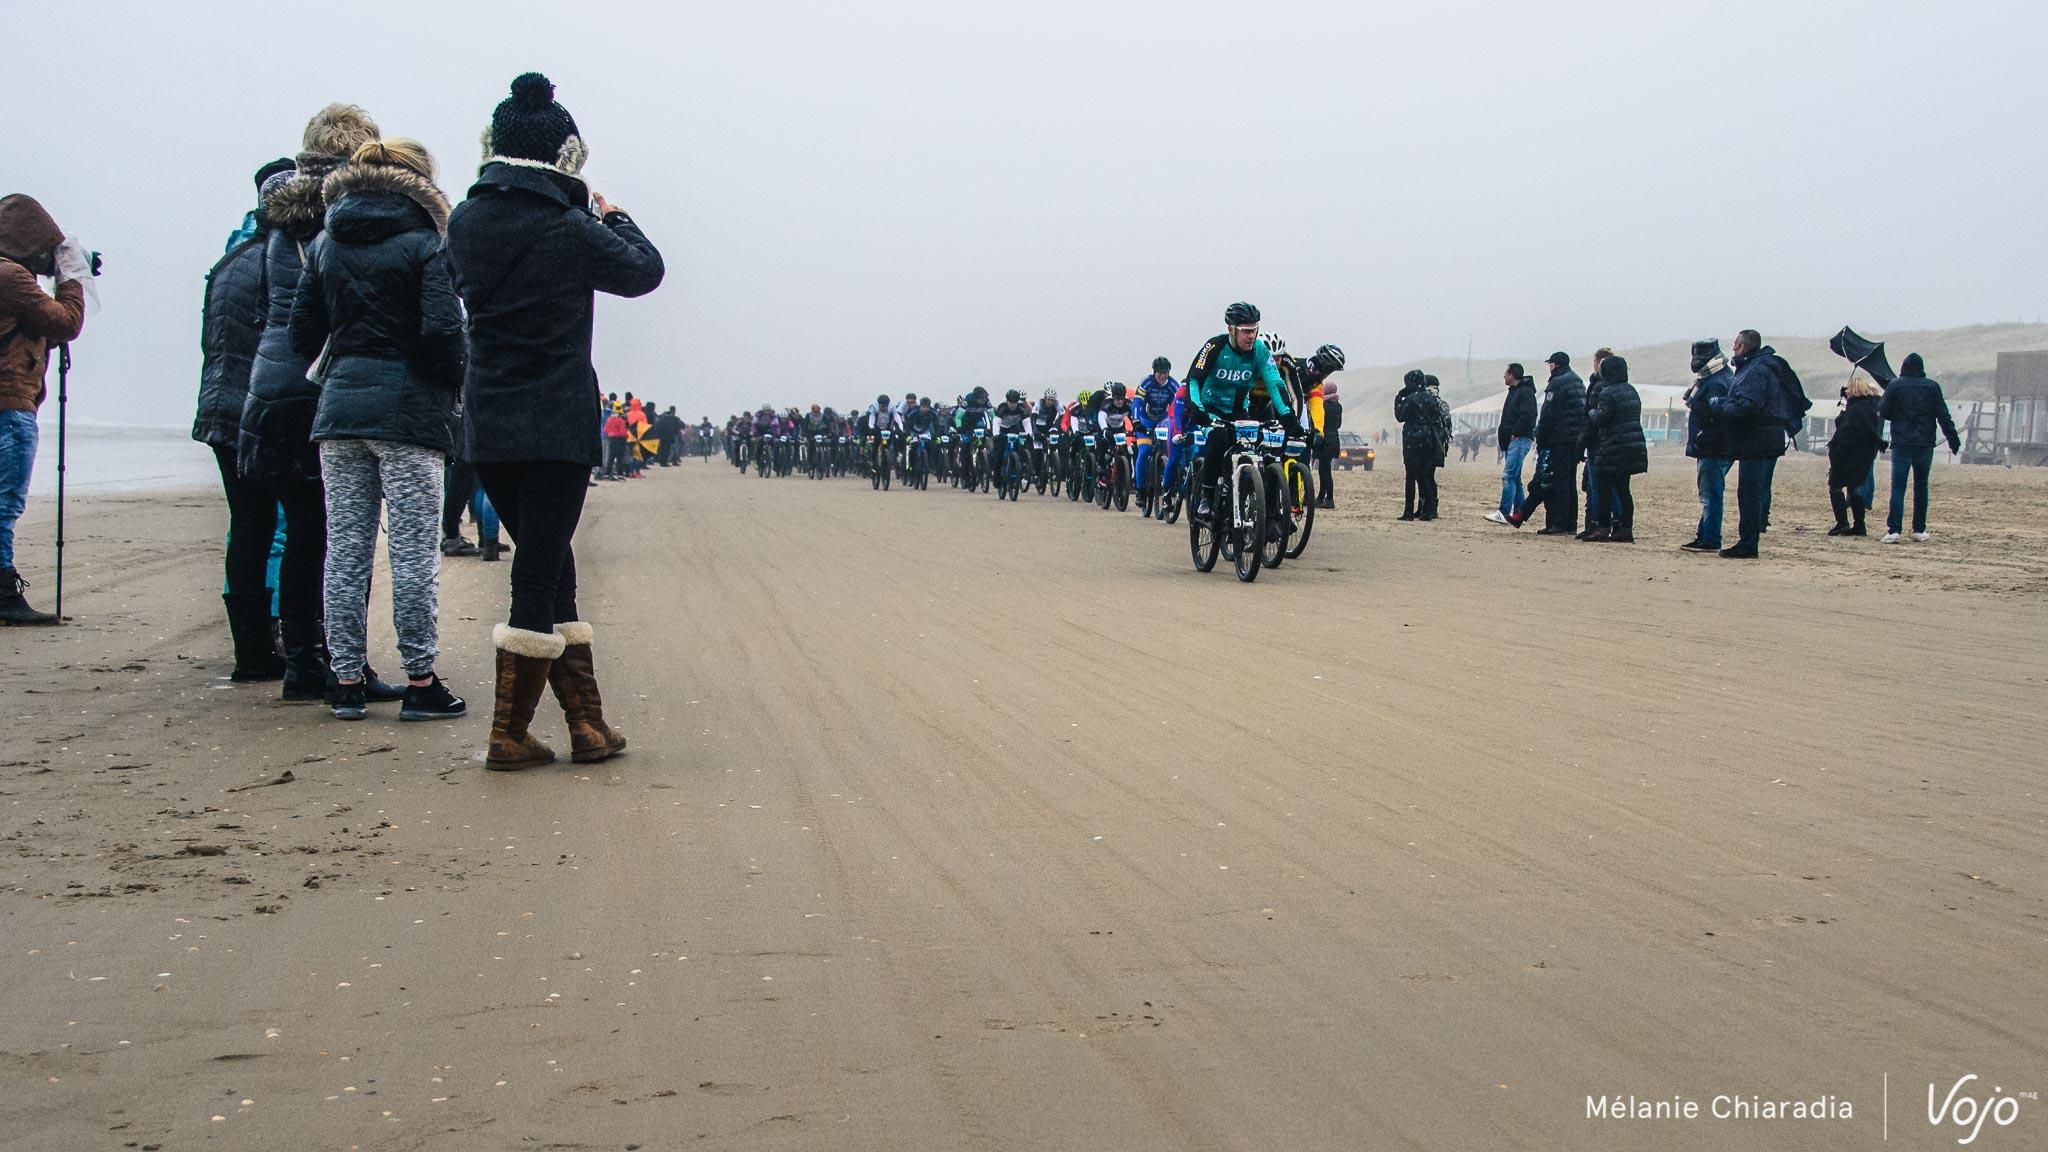 beachrace_egmond_pier_egmond_mel_copyright_obeart_vojomag-26